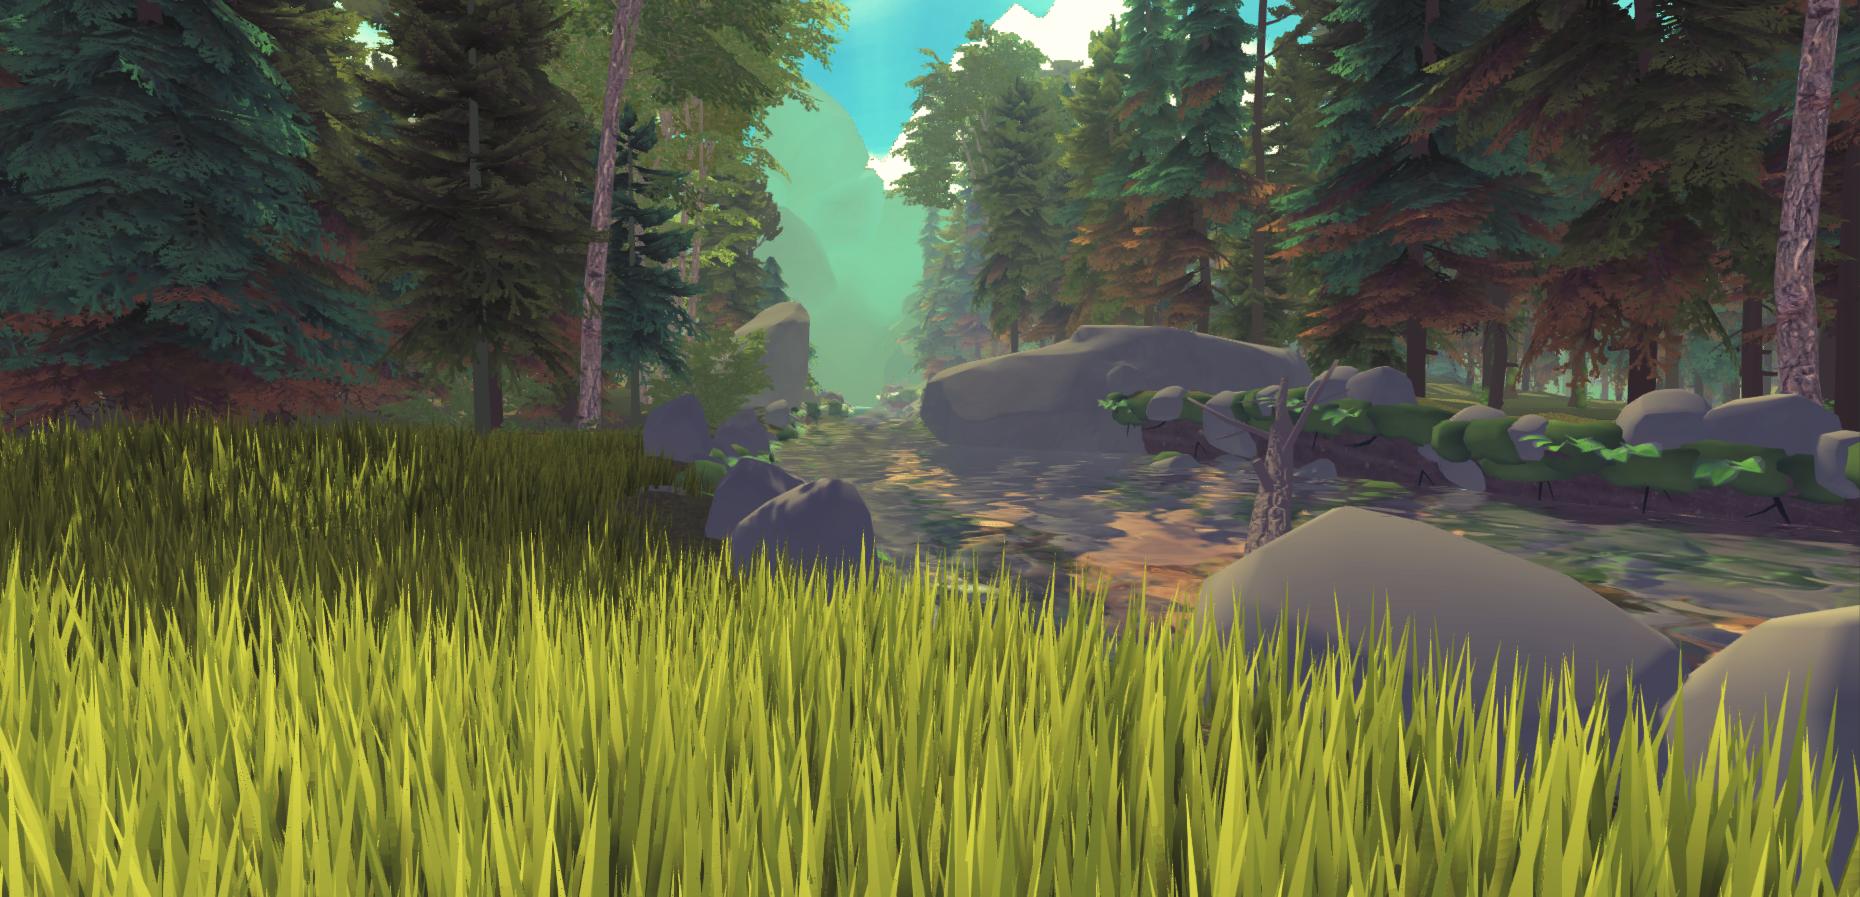 IndieDB River Grass